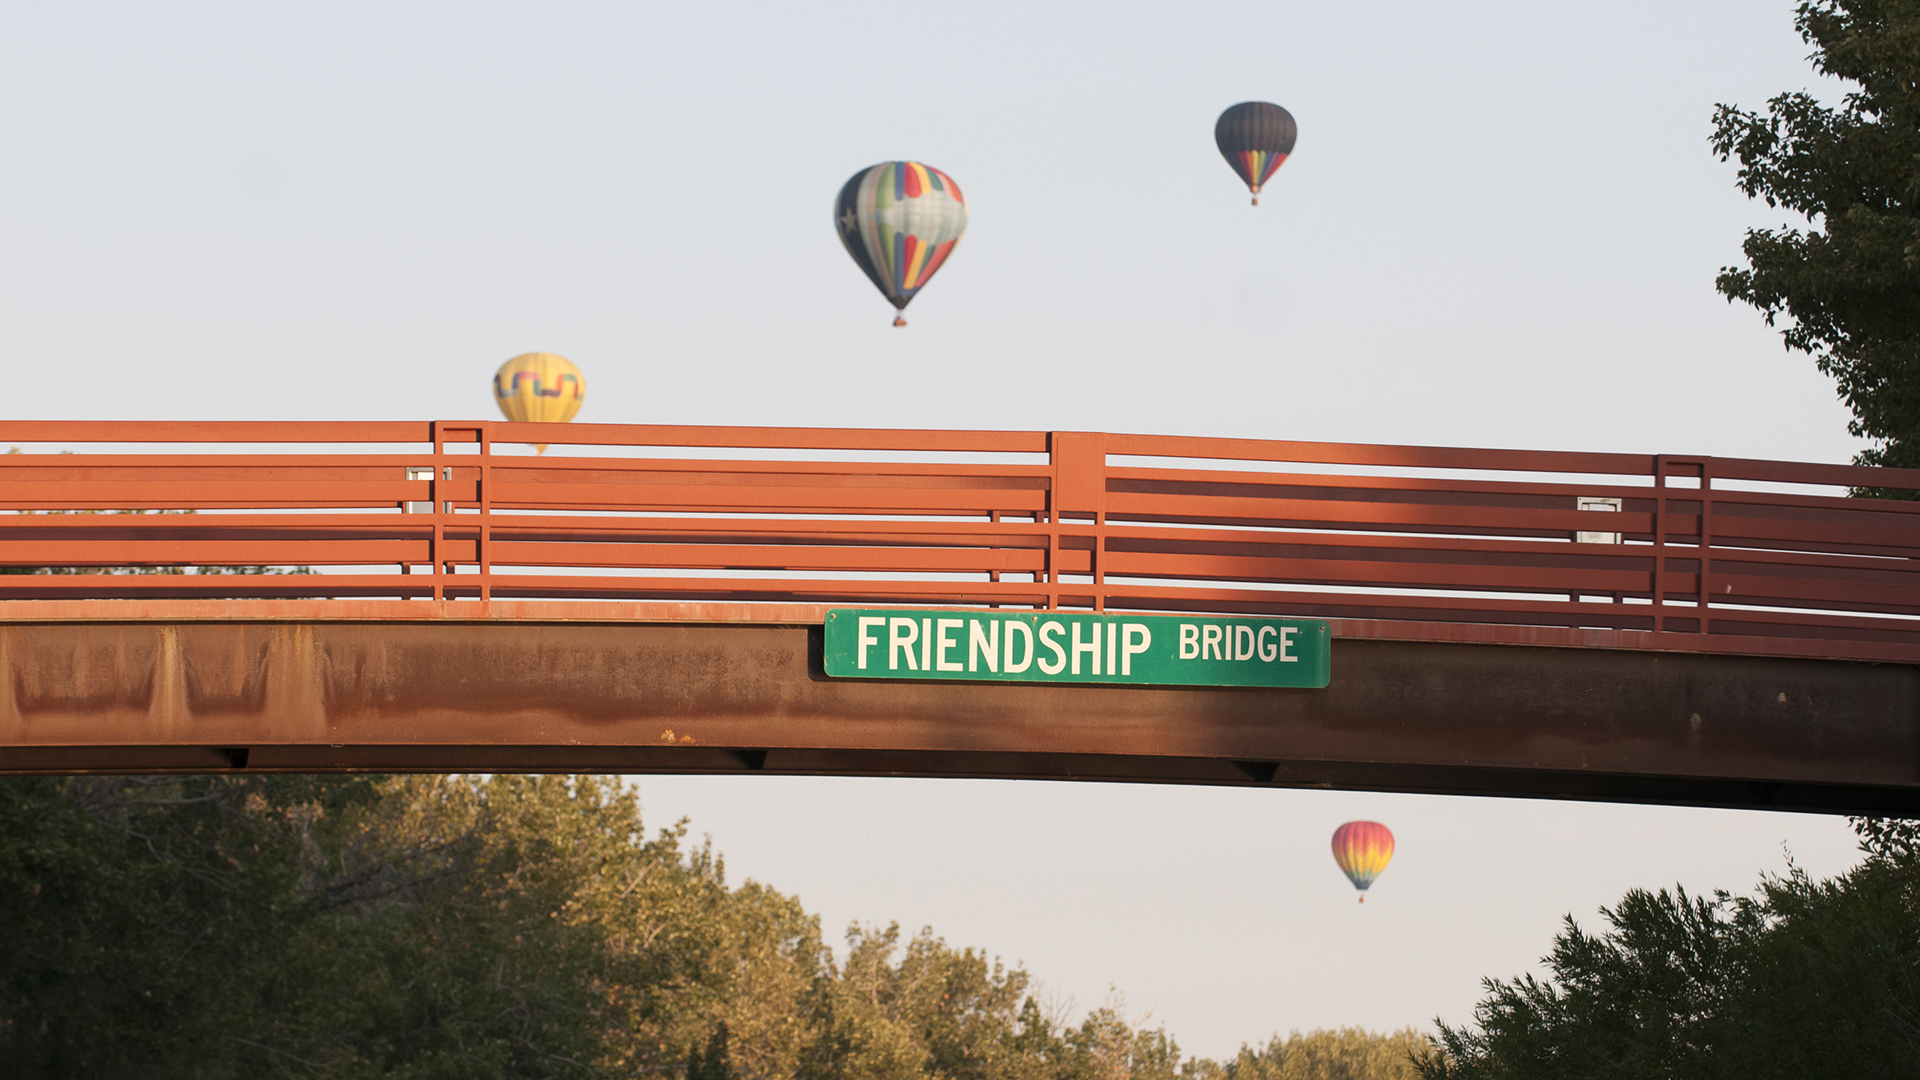 Spirit of Boise Hot Air Balloon Festival flies over Friendship Bridge